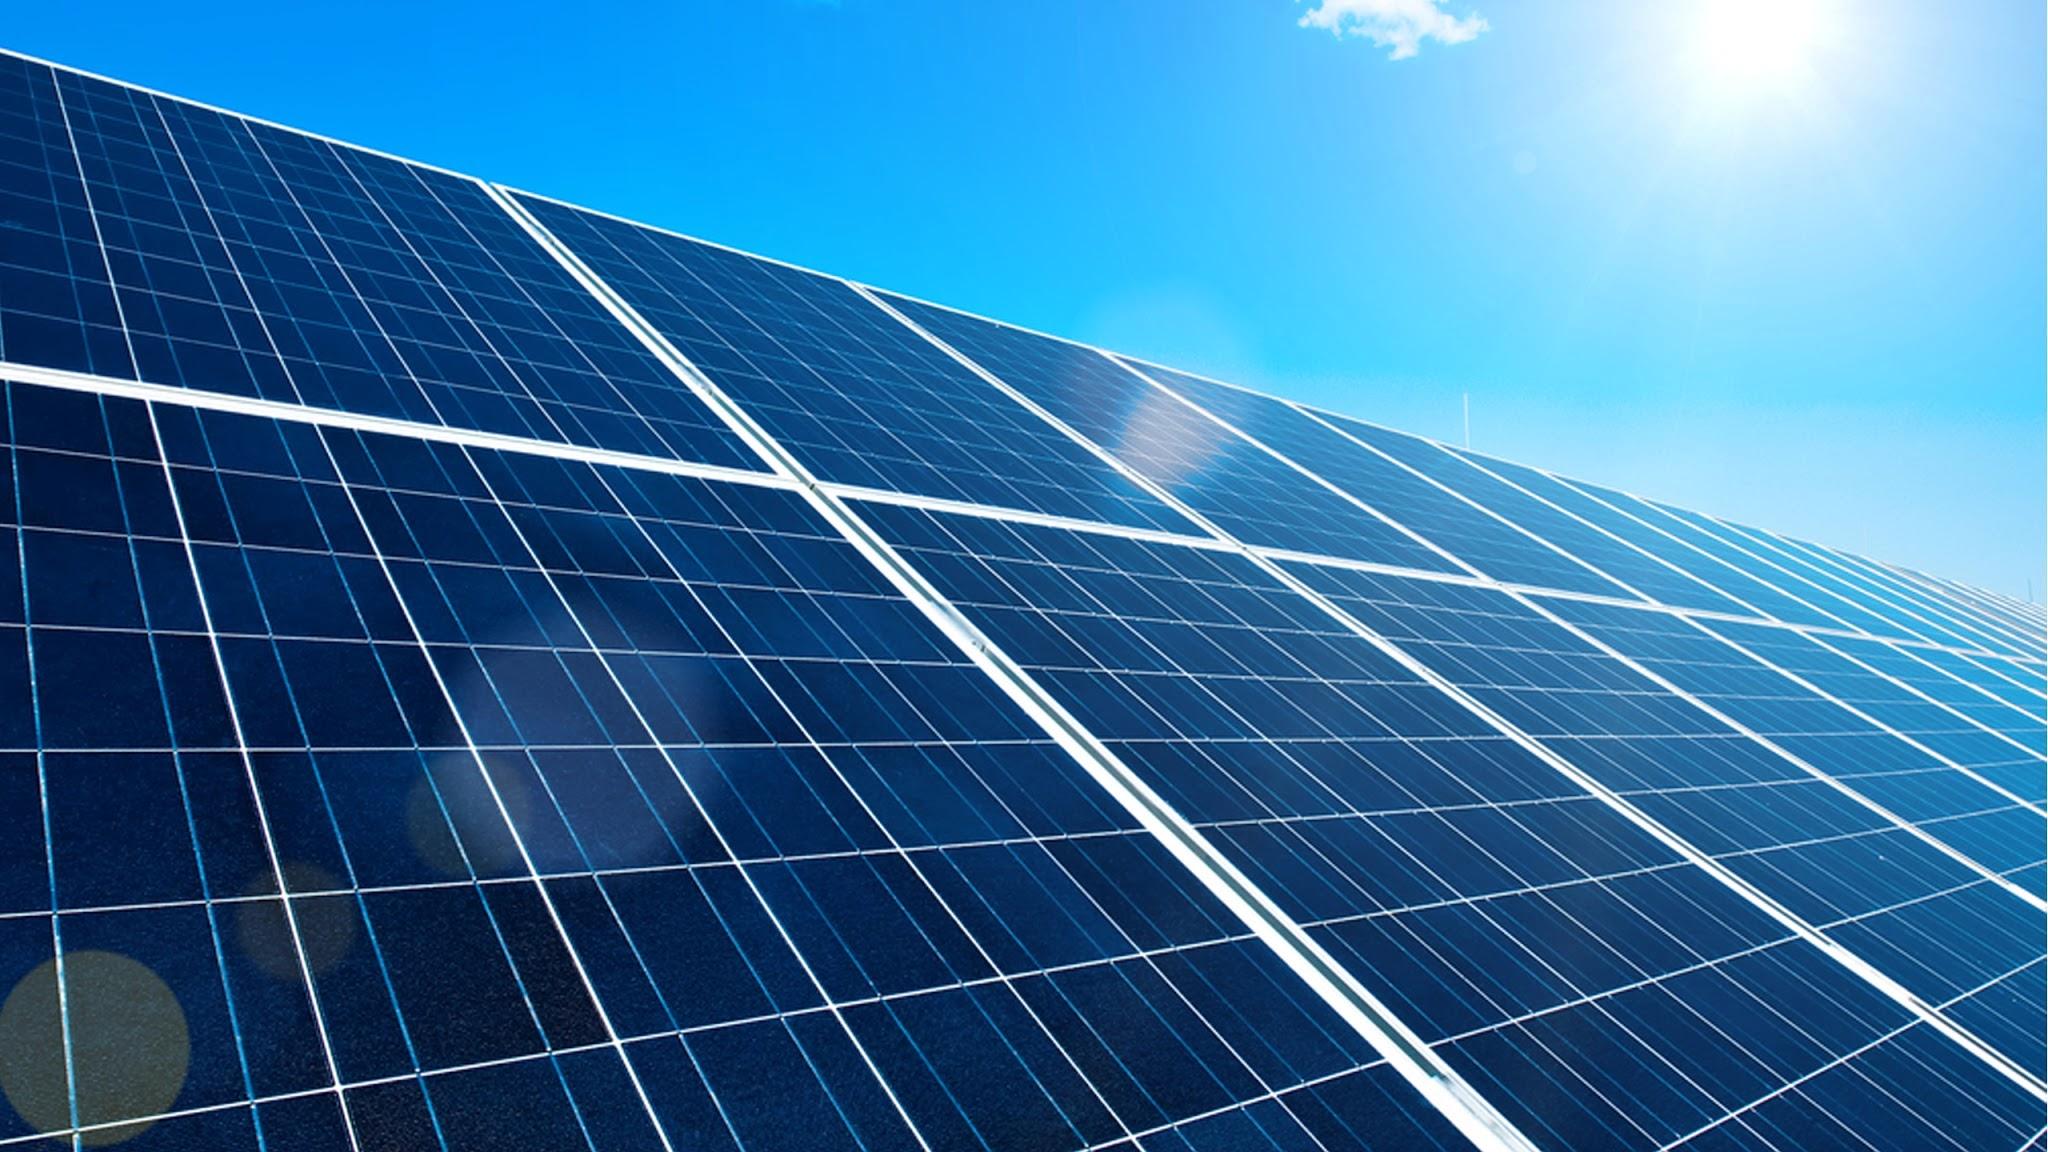 Go Back Gallery For Solar Panel Wallpaper 2048x1152